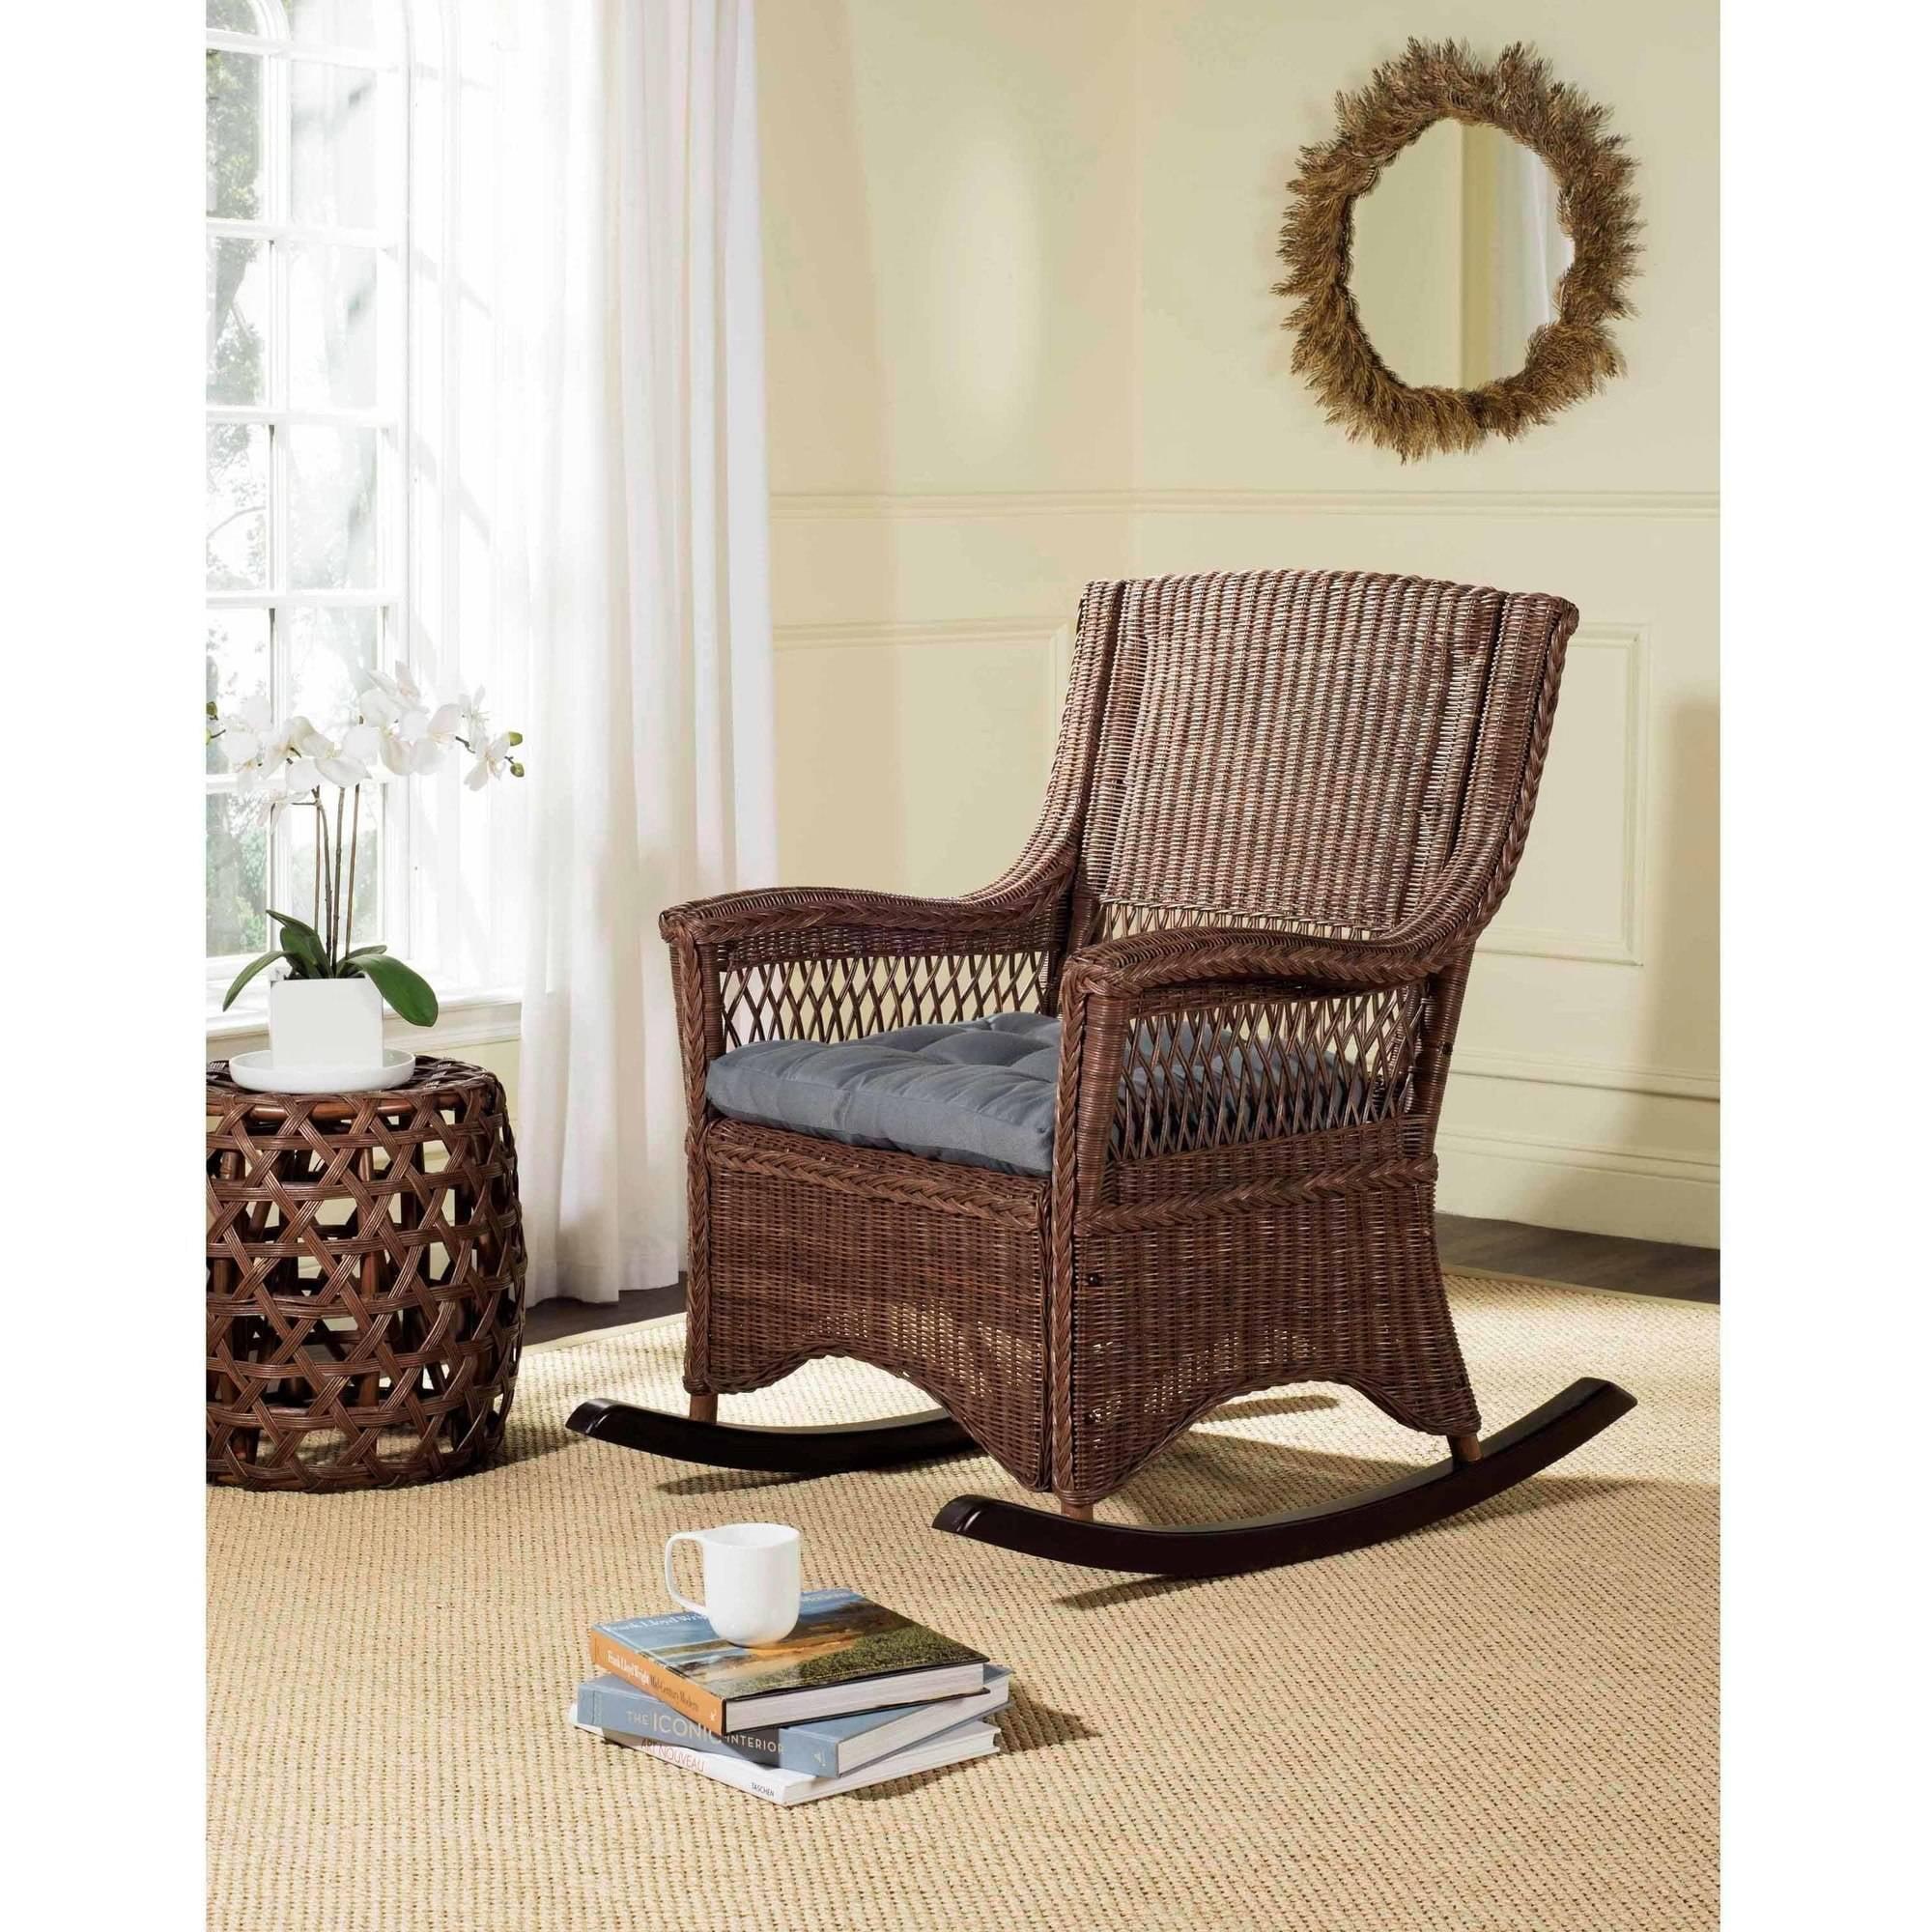 Safavieh Aria Rattan Rocking Chair by Safavieh